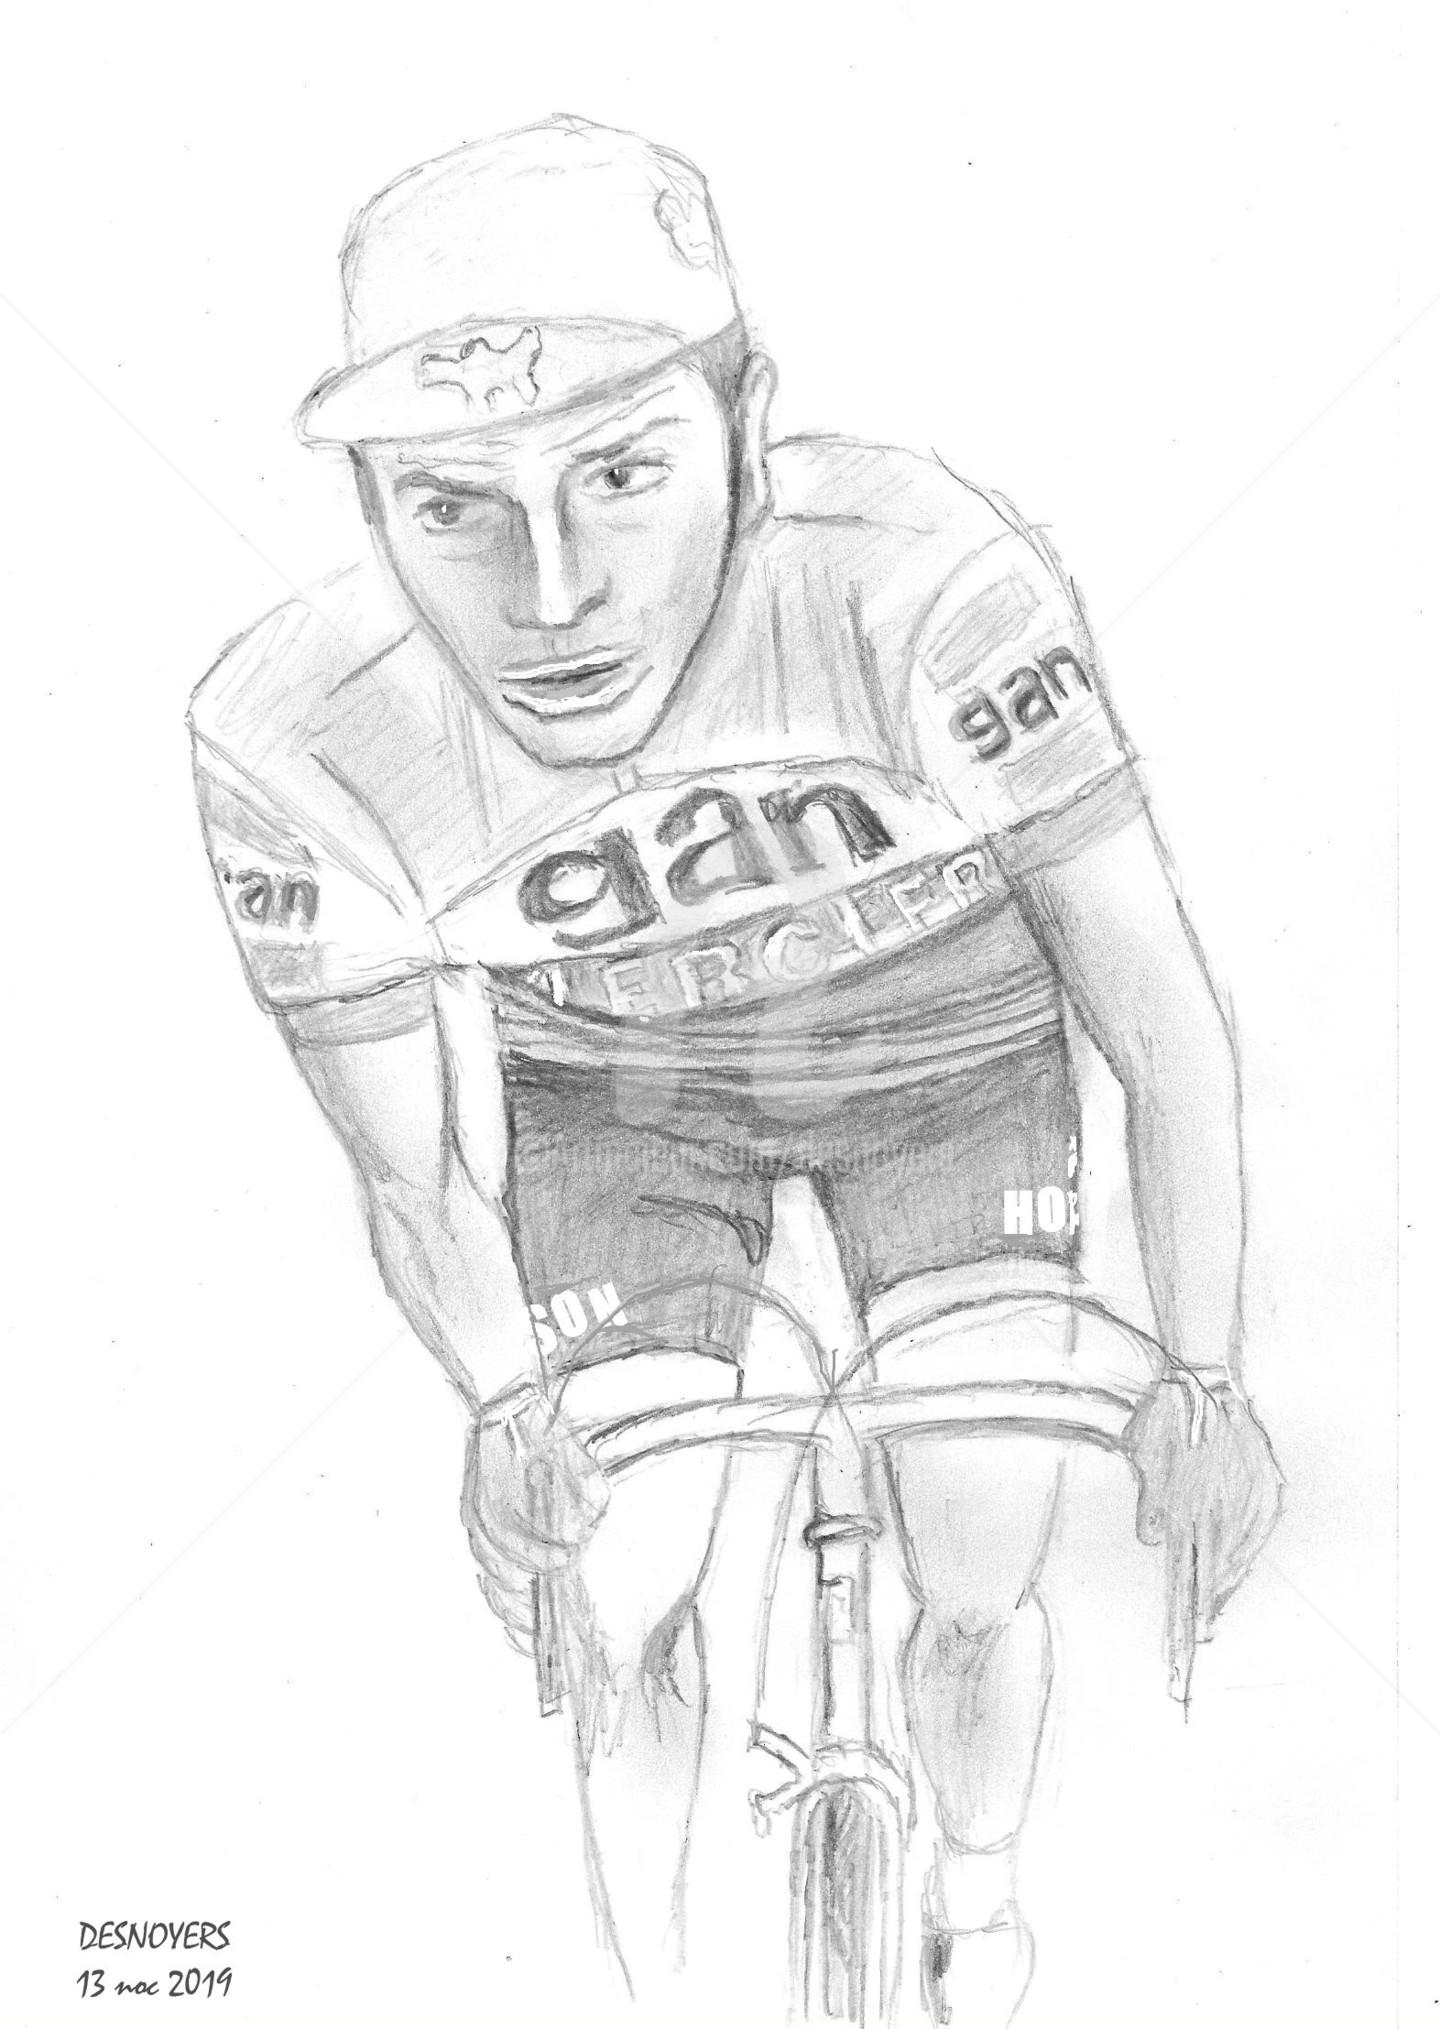 Desnoyers - Raymond Poulidor